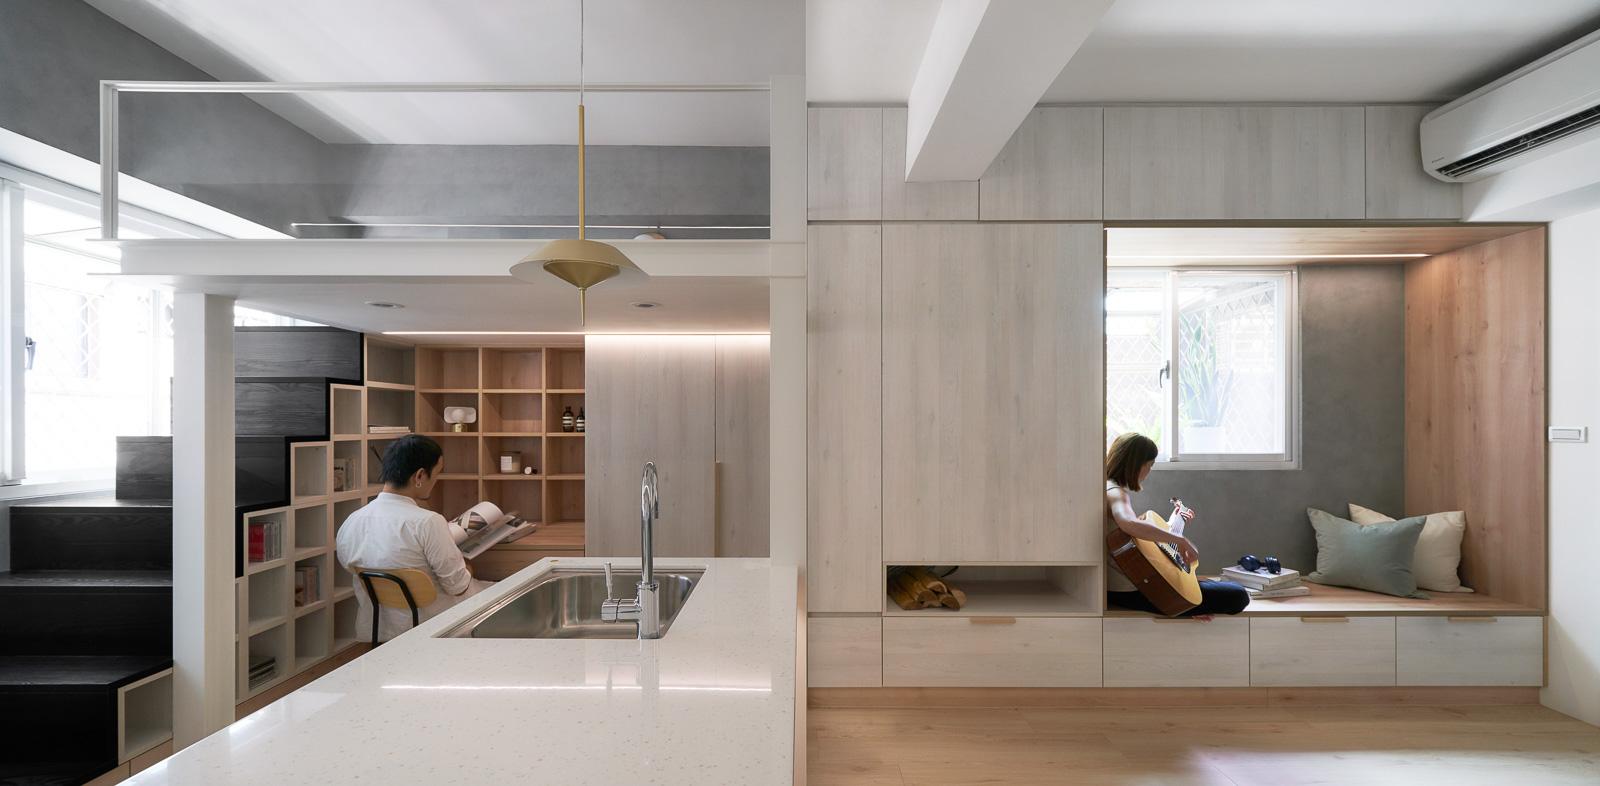 NestSpace_SmallHouse_S-093